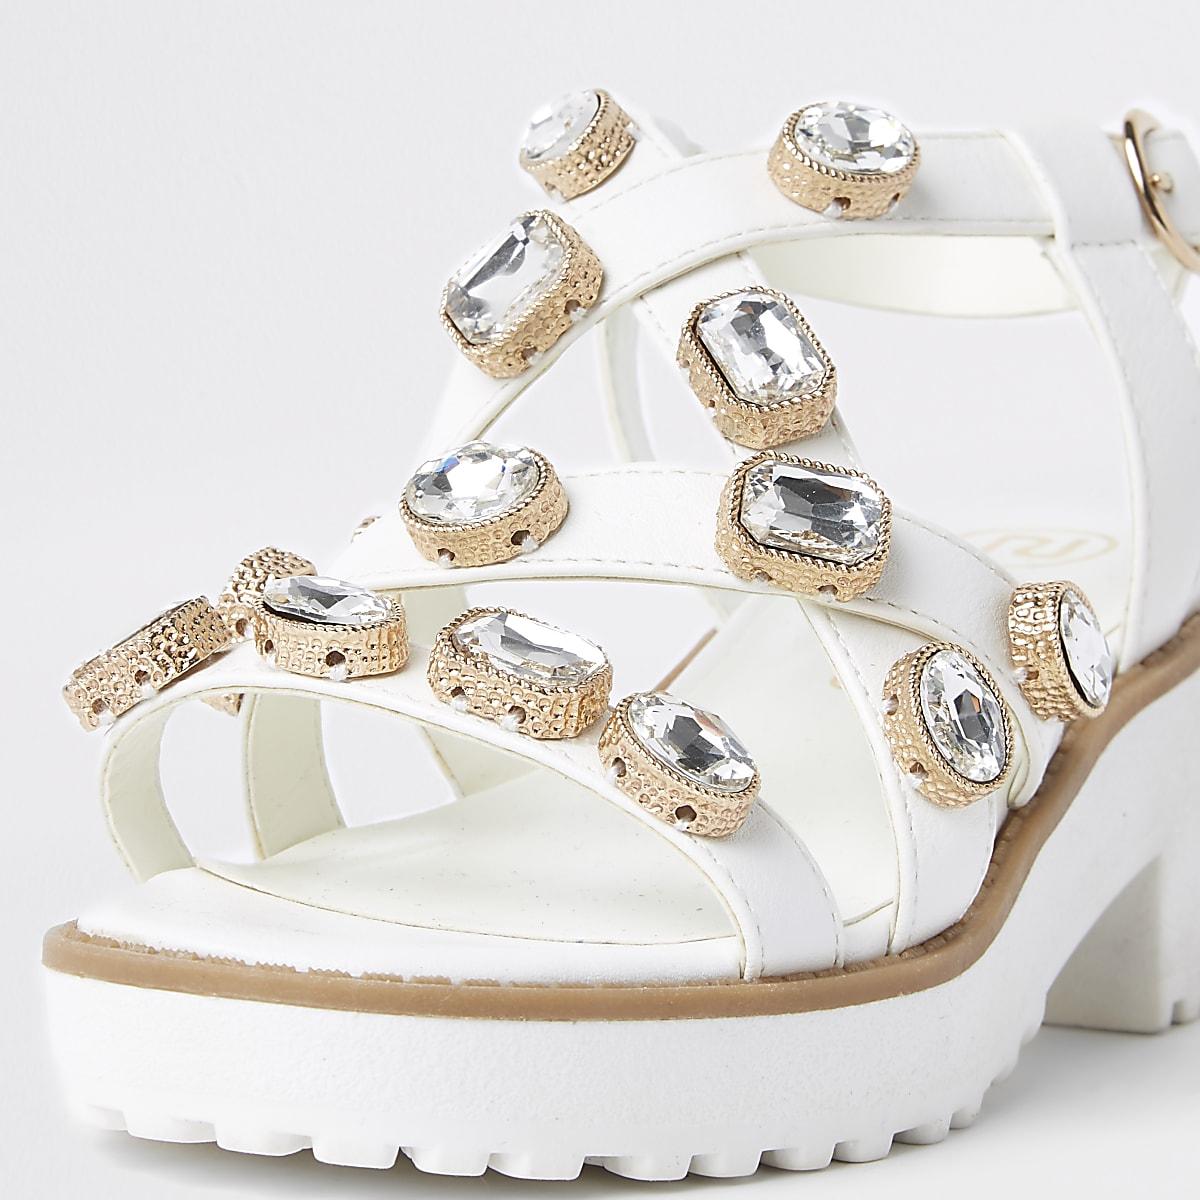 711873430476 Girls white embellished chunky sandals - Sandals - Footwear - girls